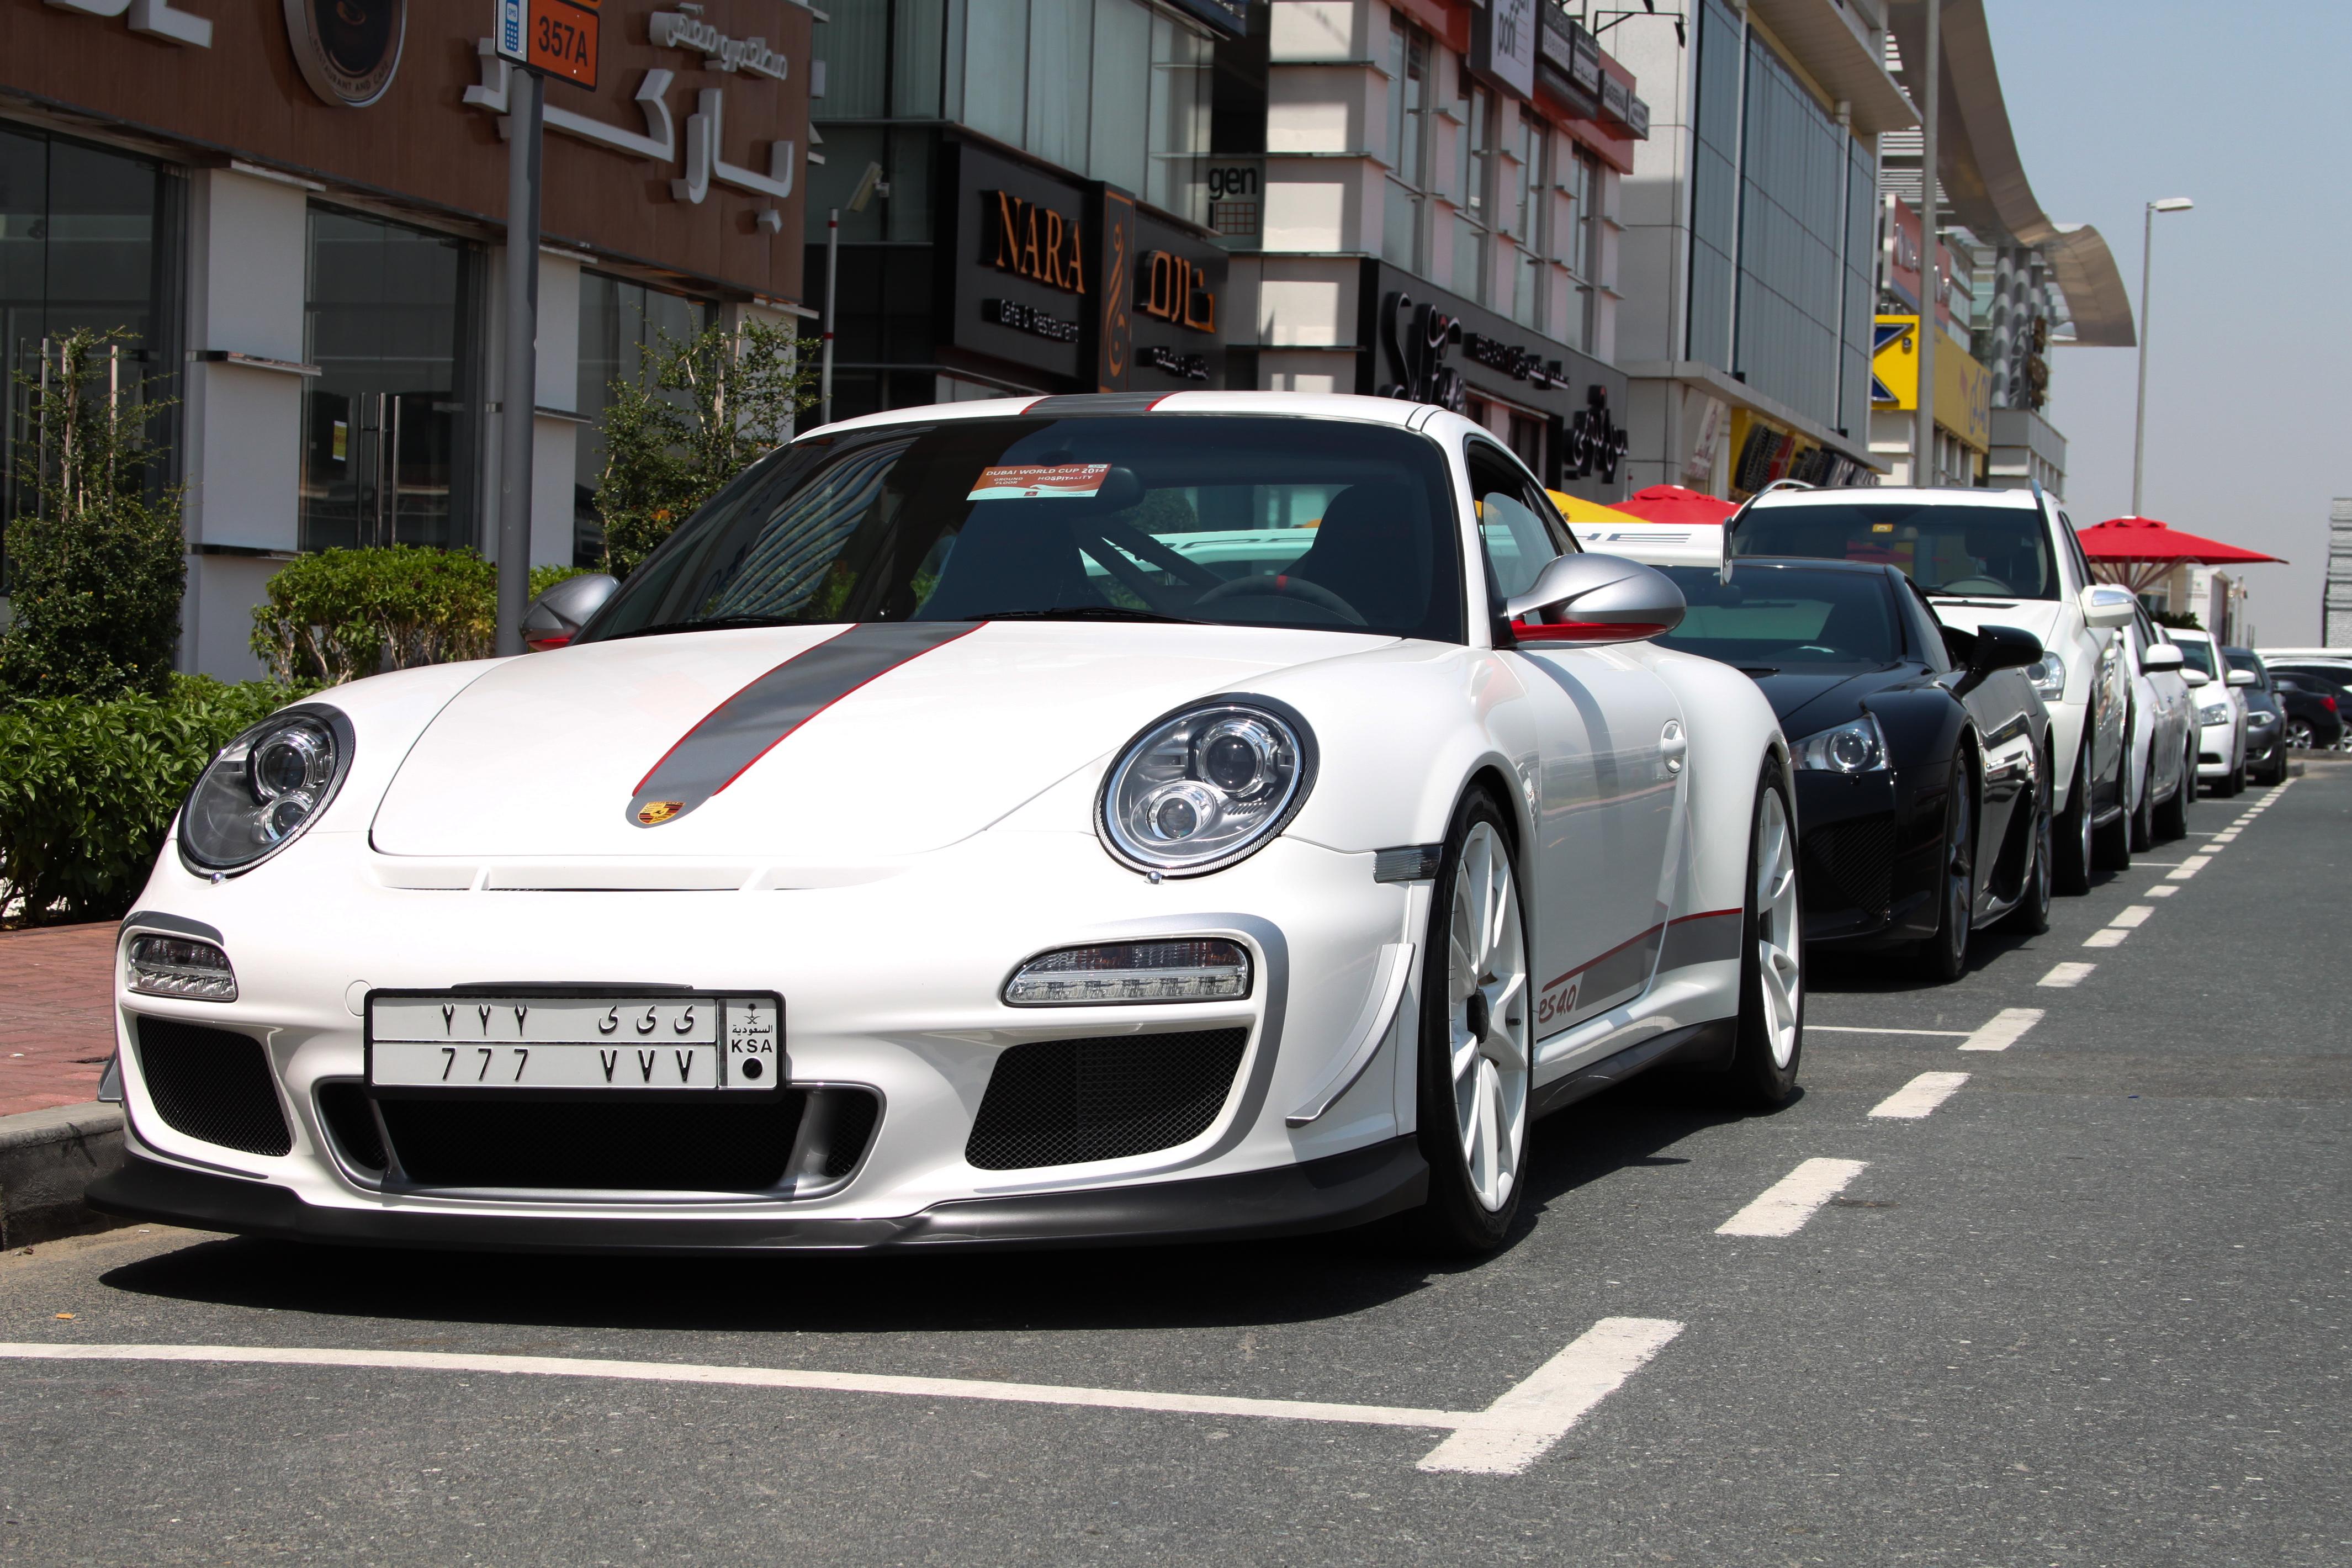 Wallpaper : white, sunset, street, road, supercars, Germany